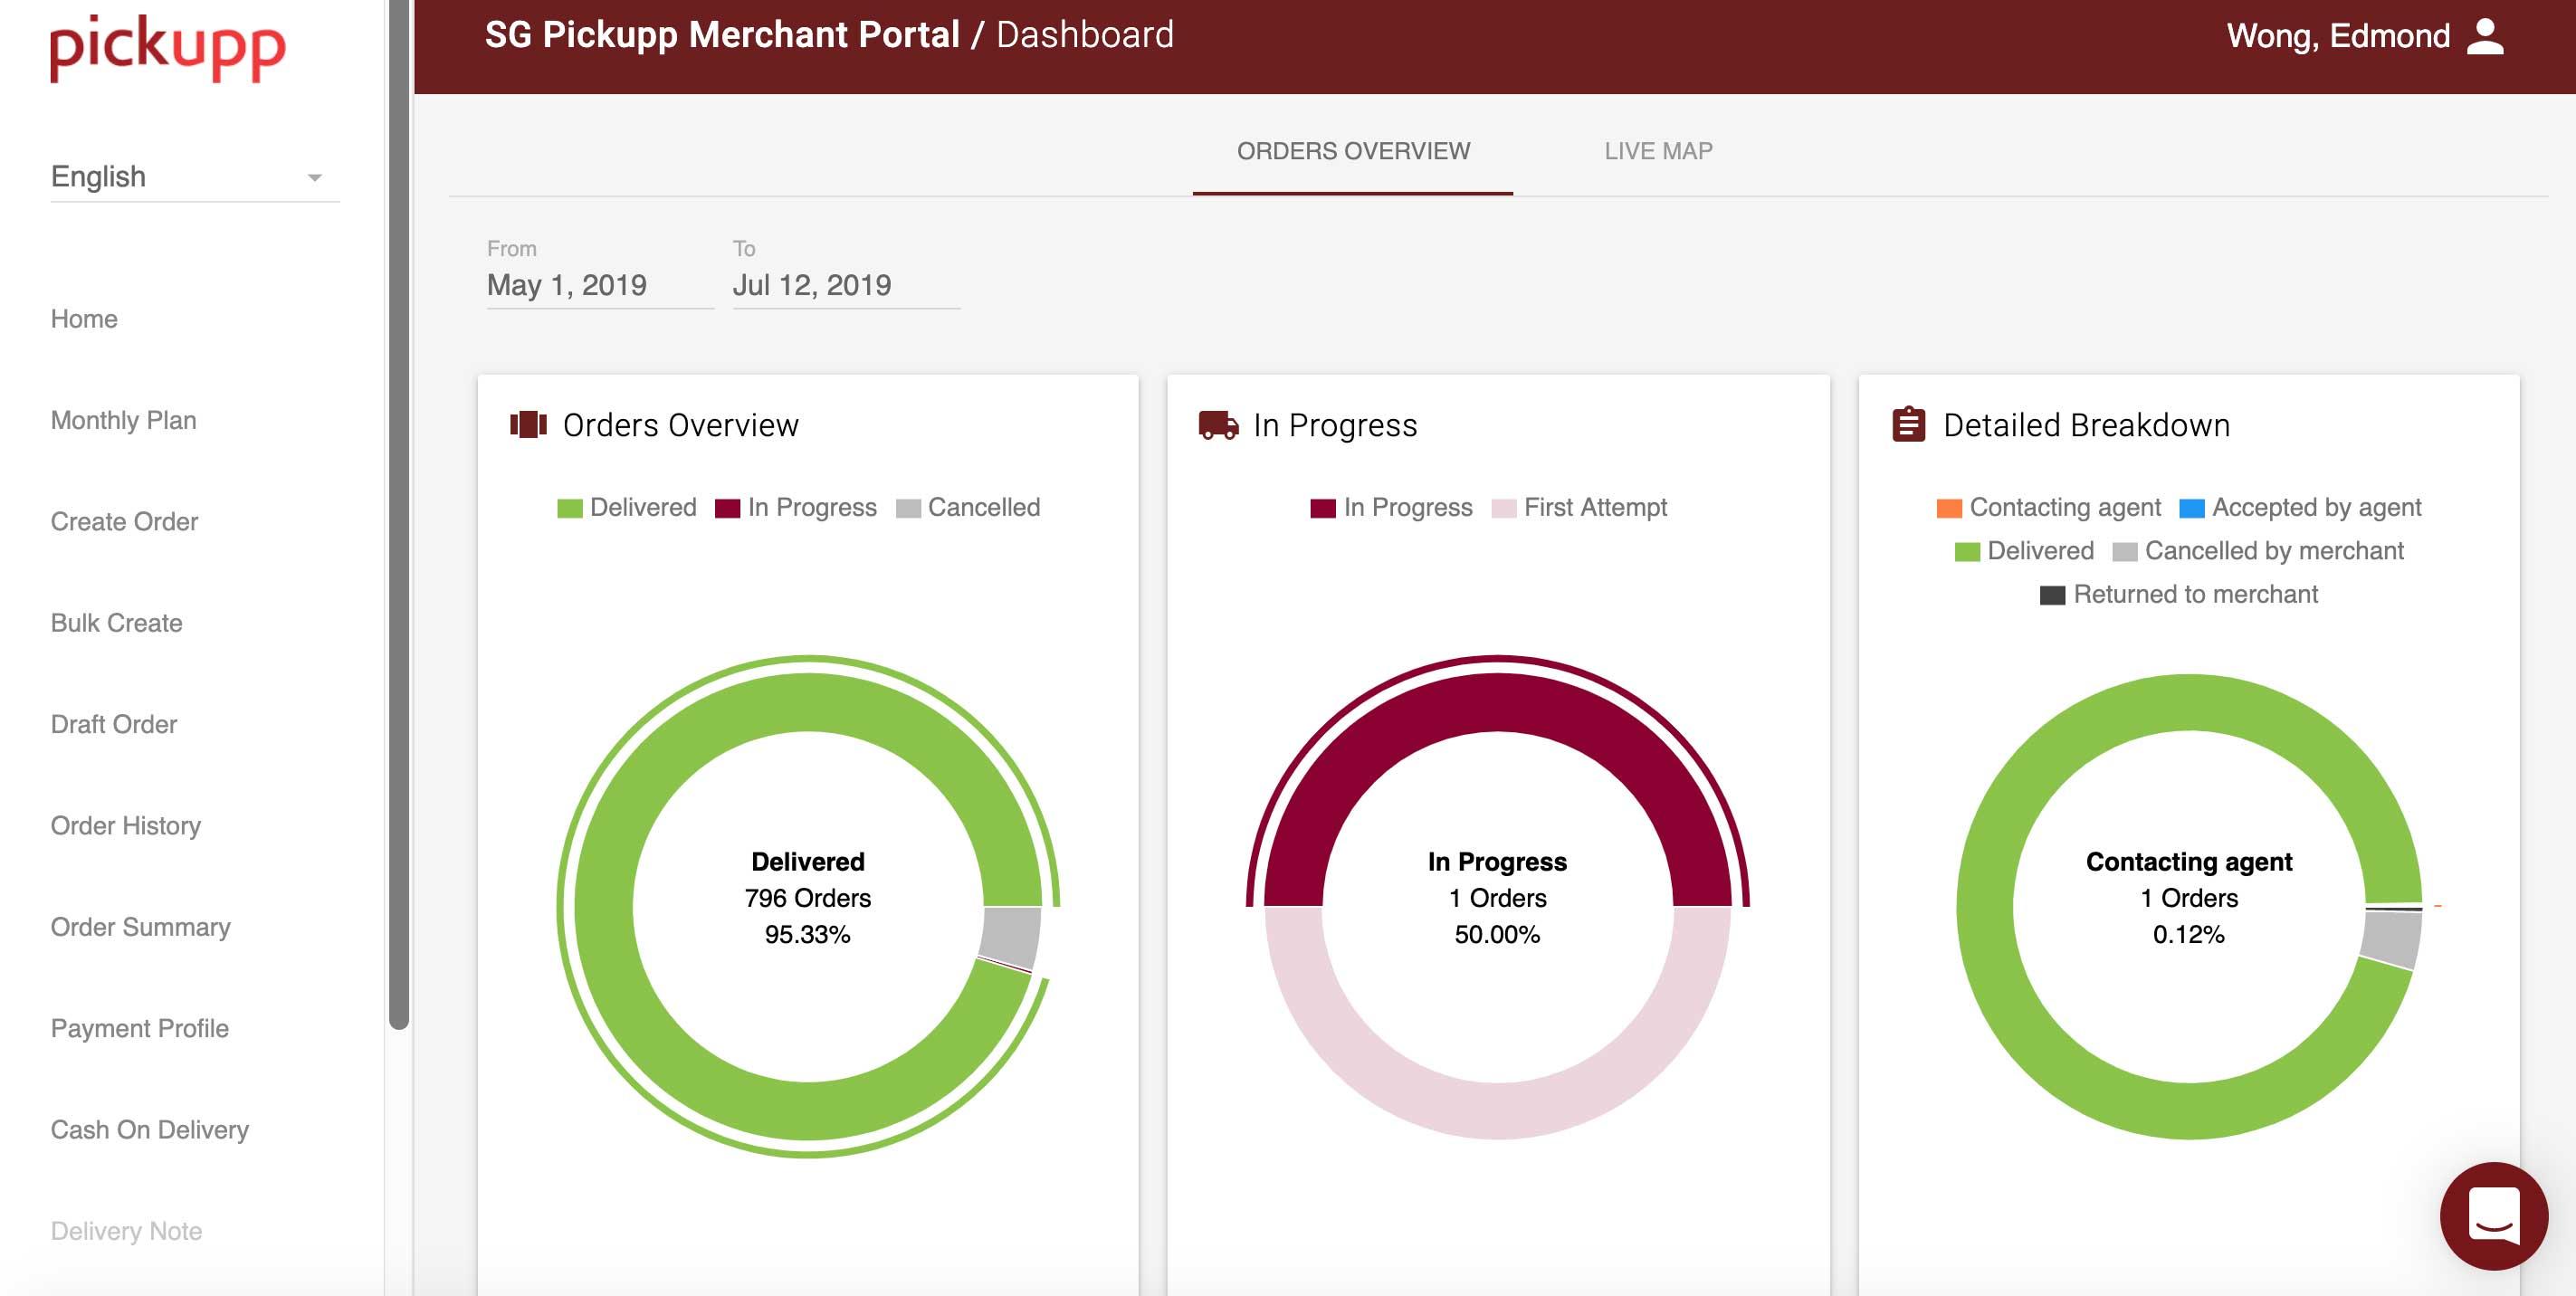 Merchant Portal